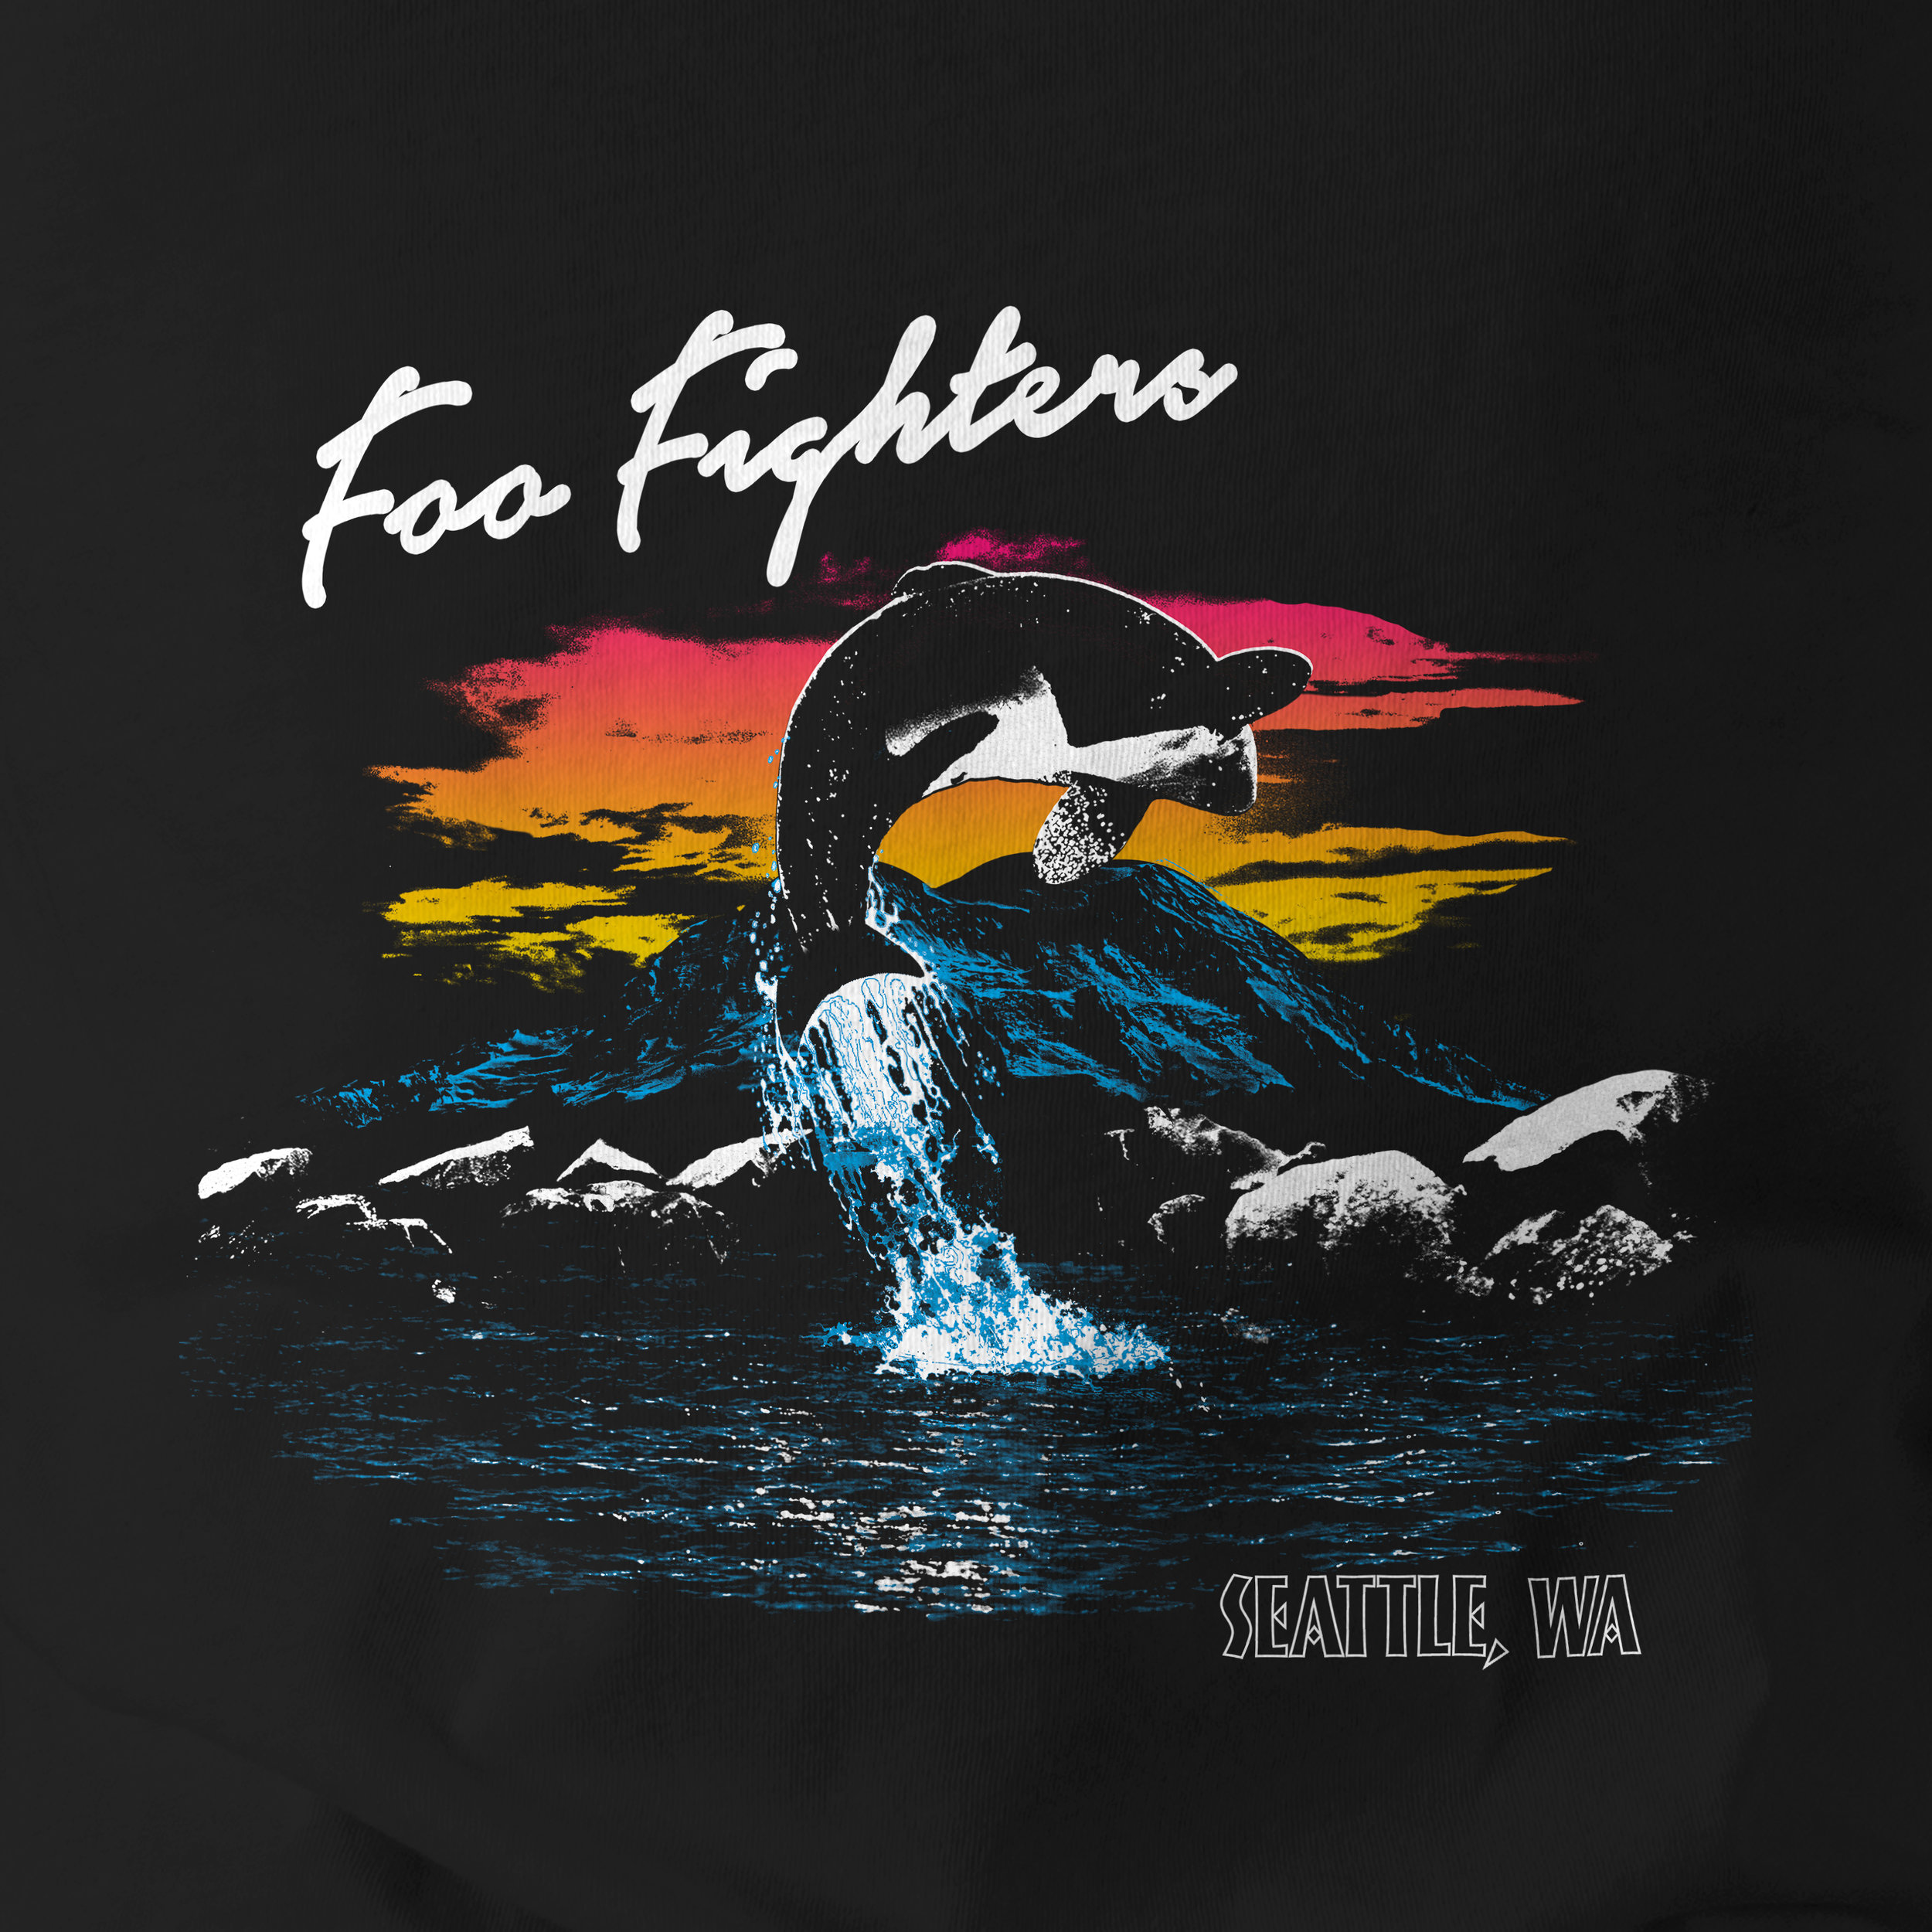 foo-fighters-free-willy.jpg